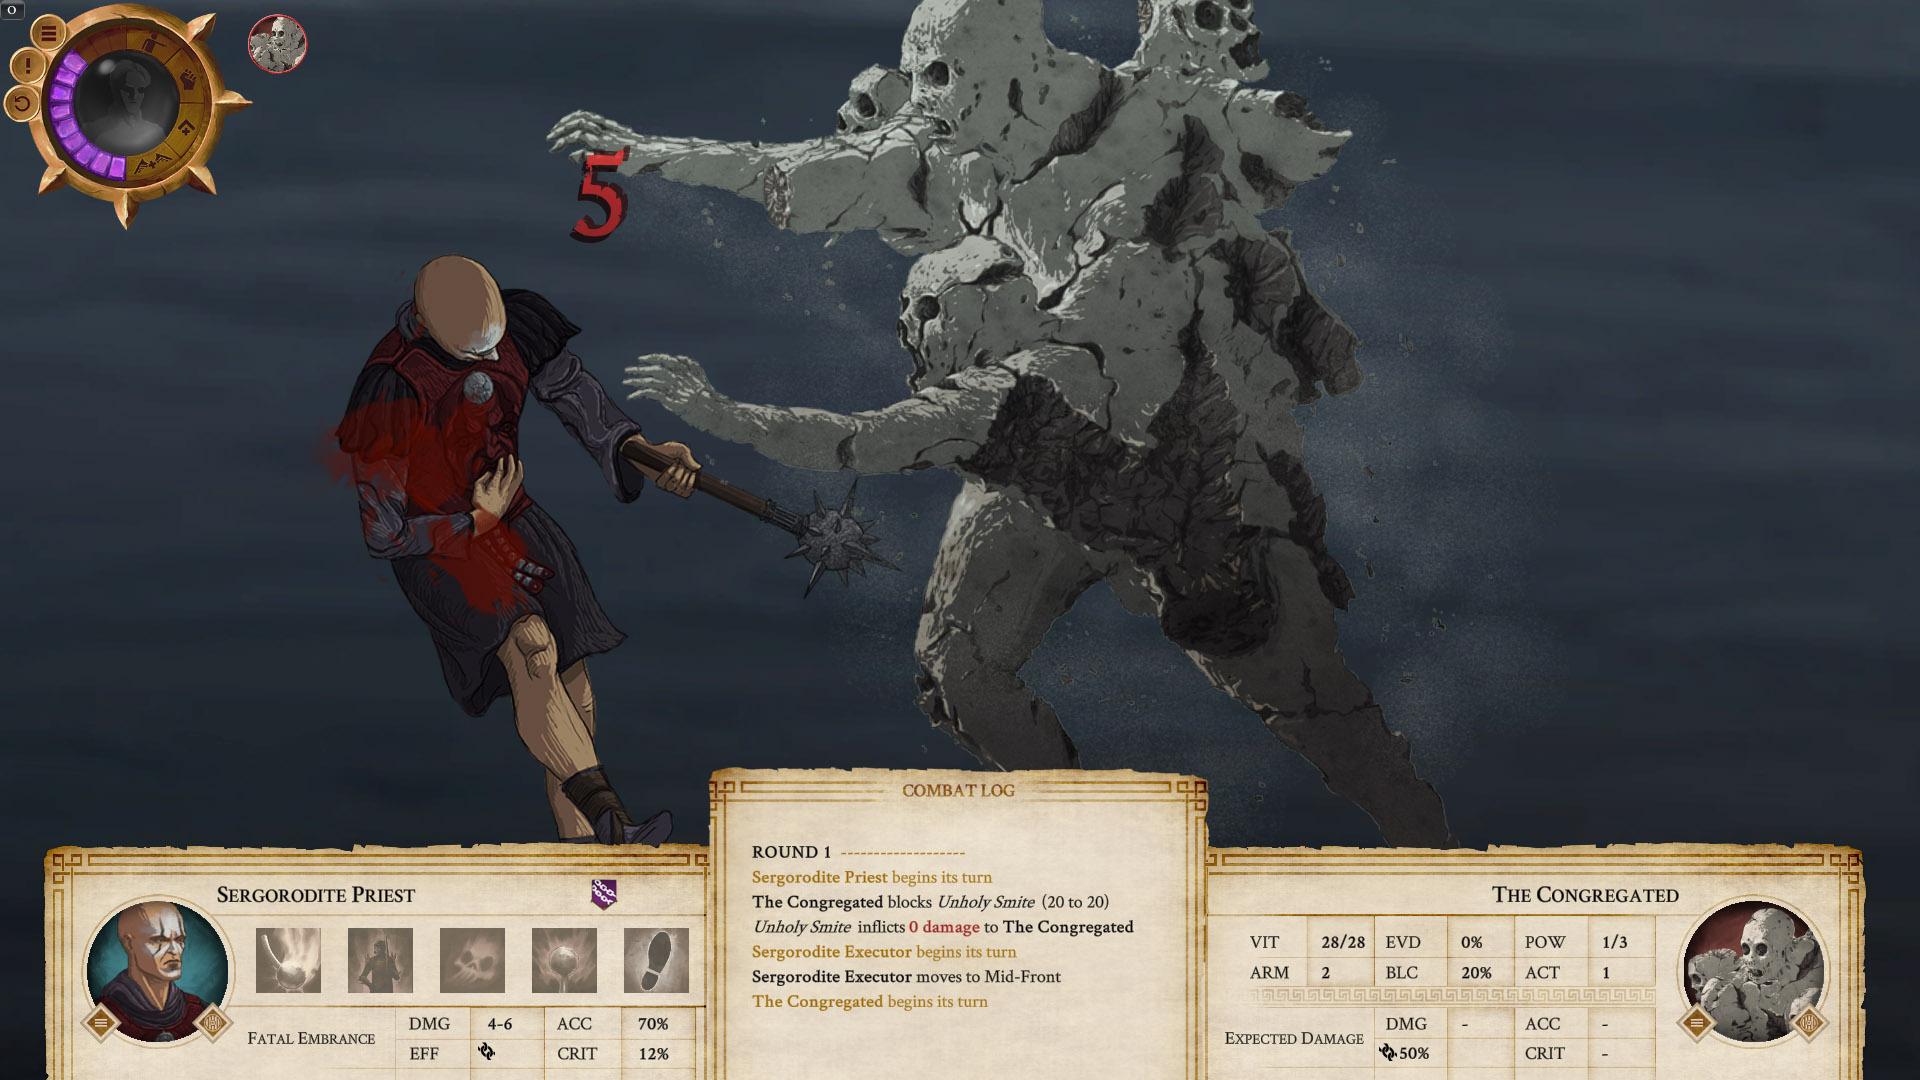 screenshot combat4